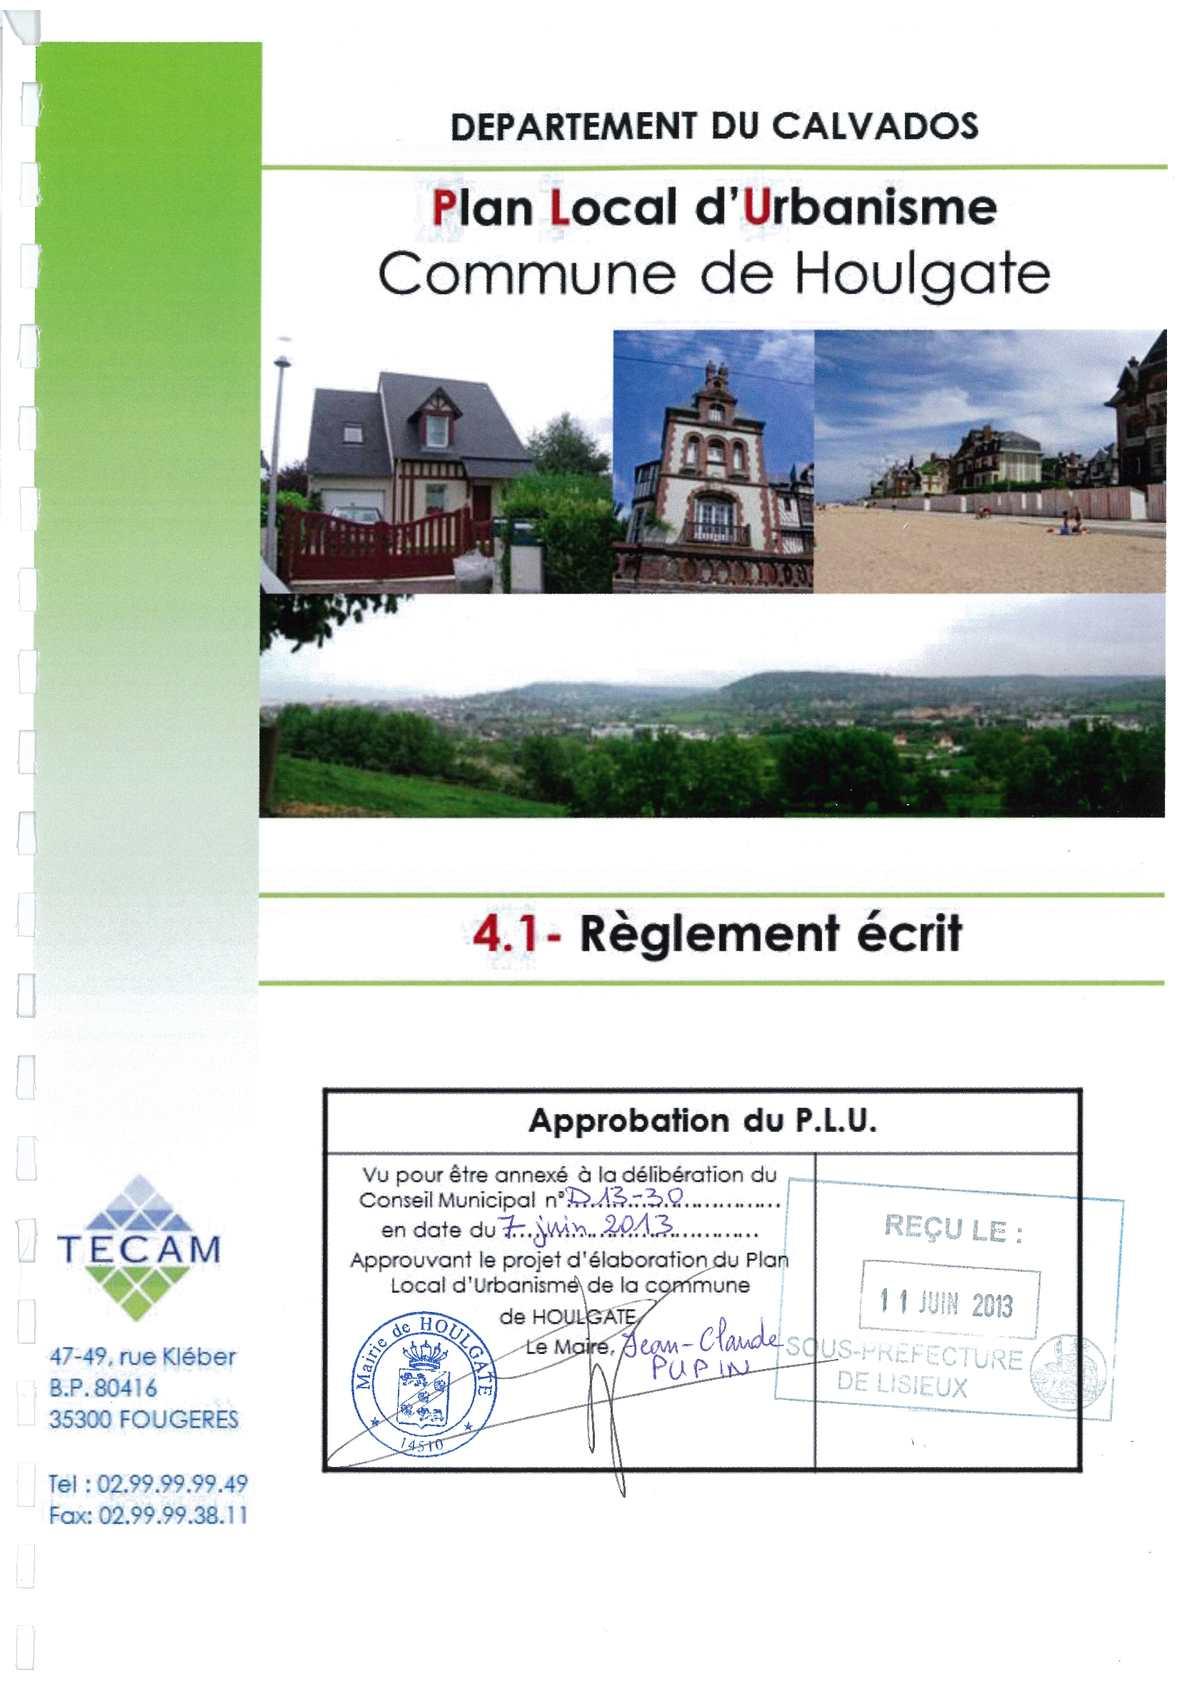 Calam o plu houlgate reglement r gles communes for Regle de l urbanisme